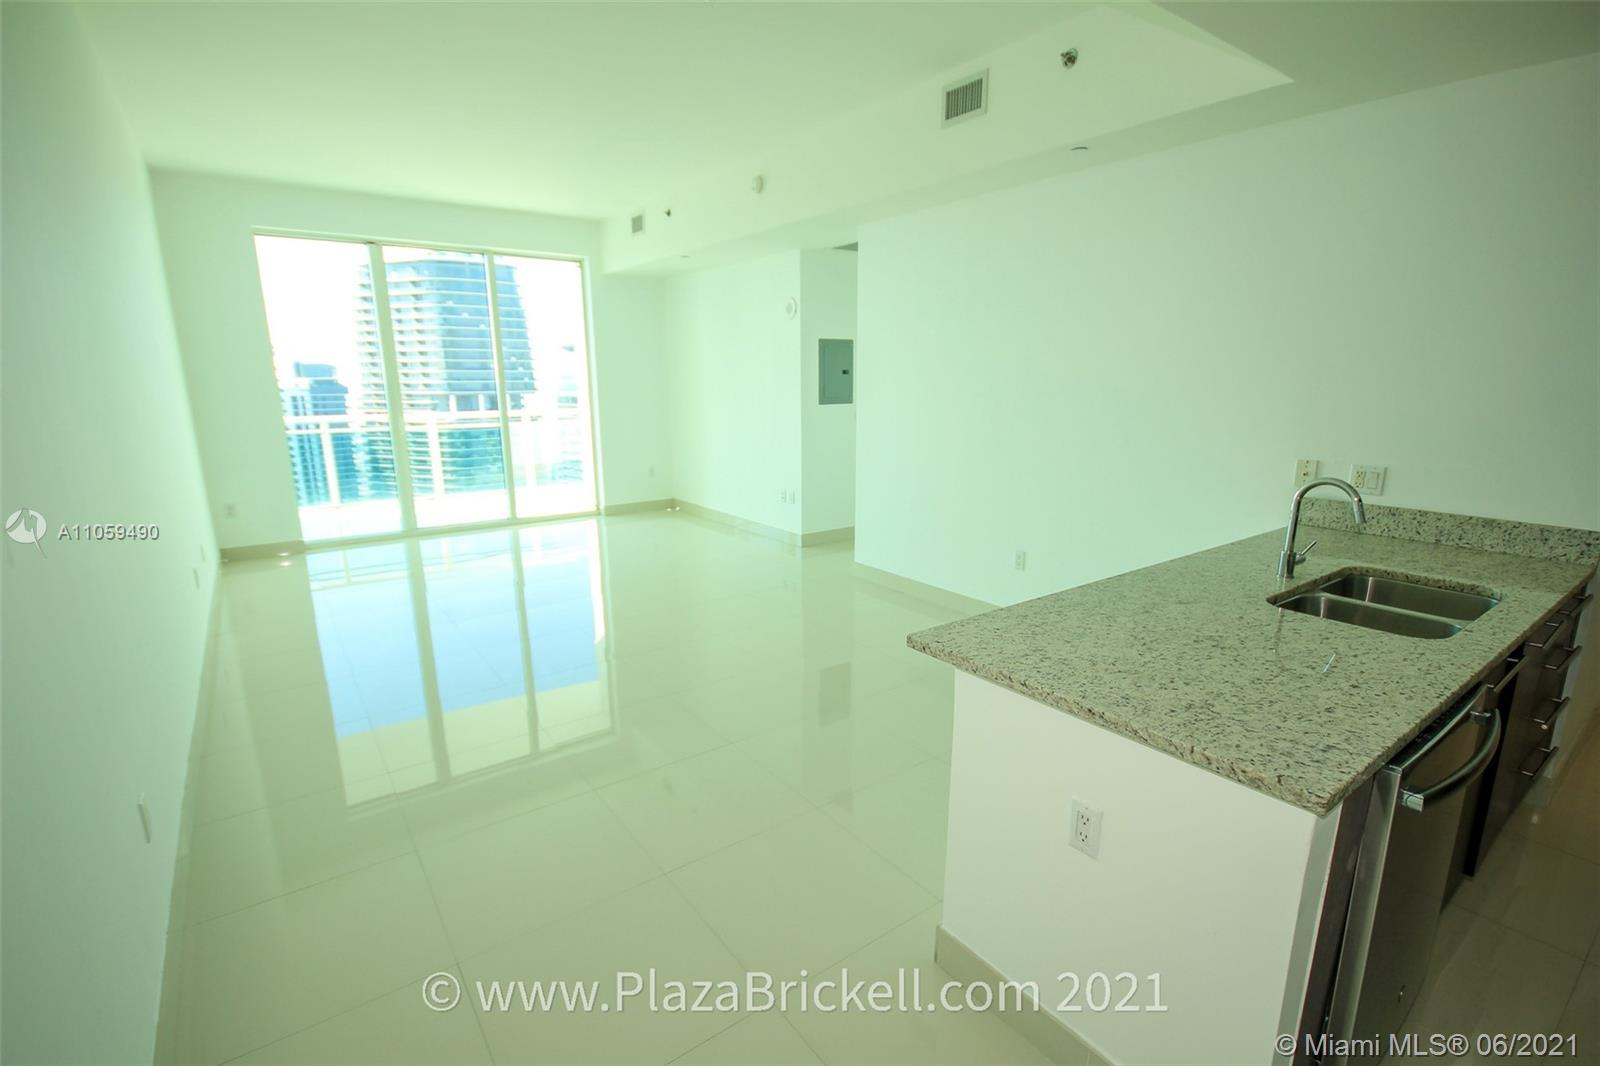 The Plaza on Brickell 1 #5100 - 950 Brickell Bay Dr #5100, Miami, FL 33131